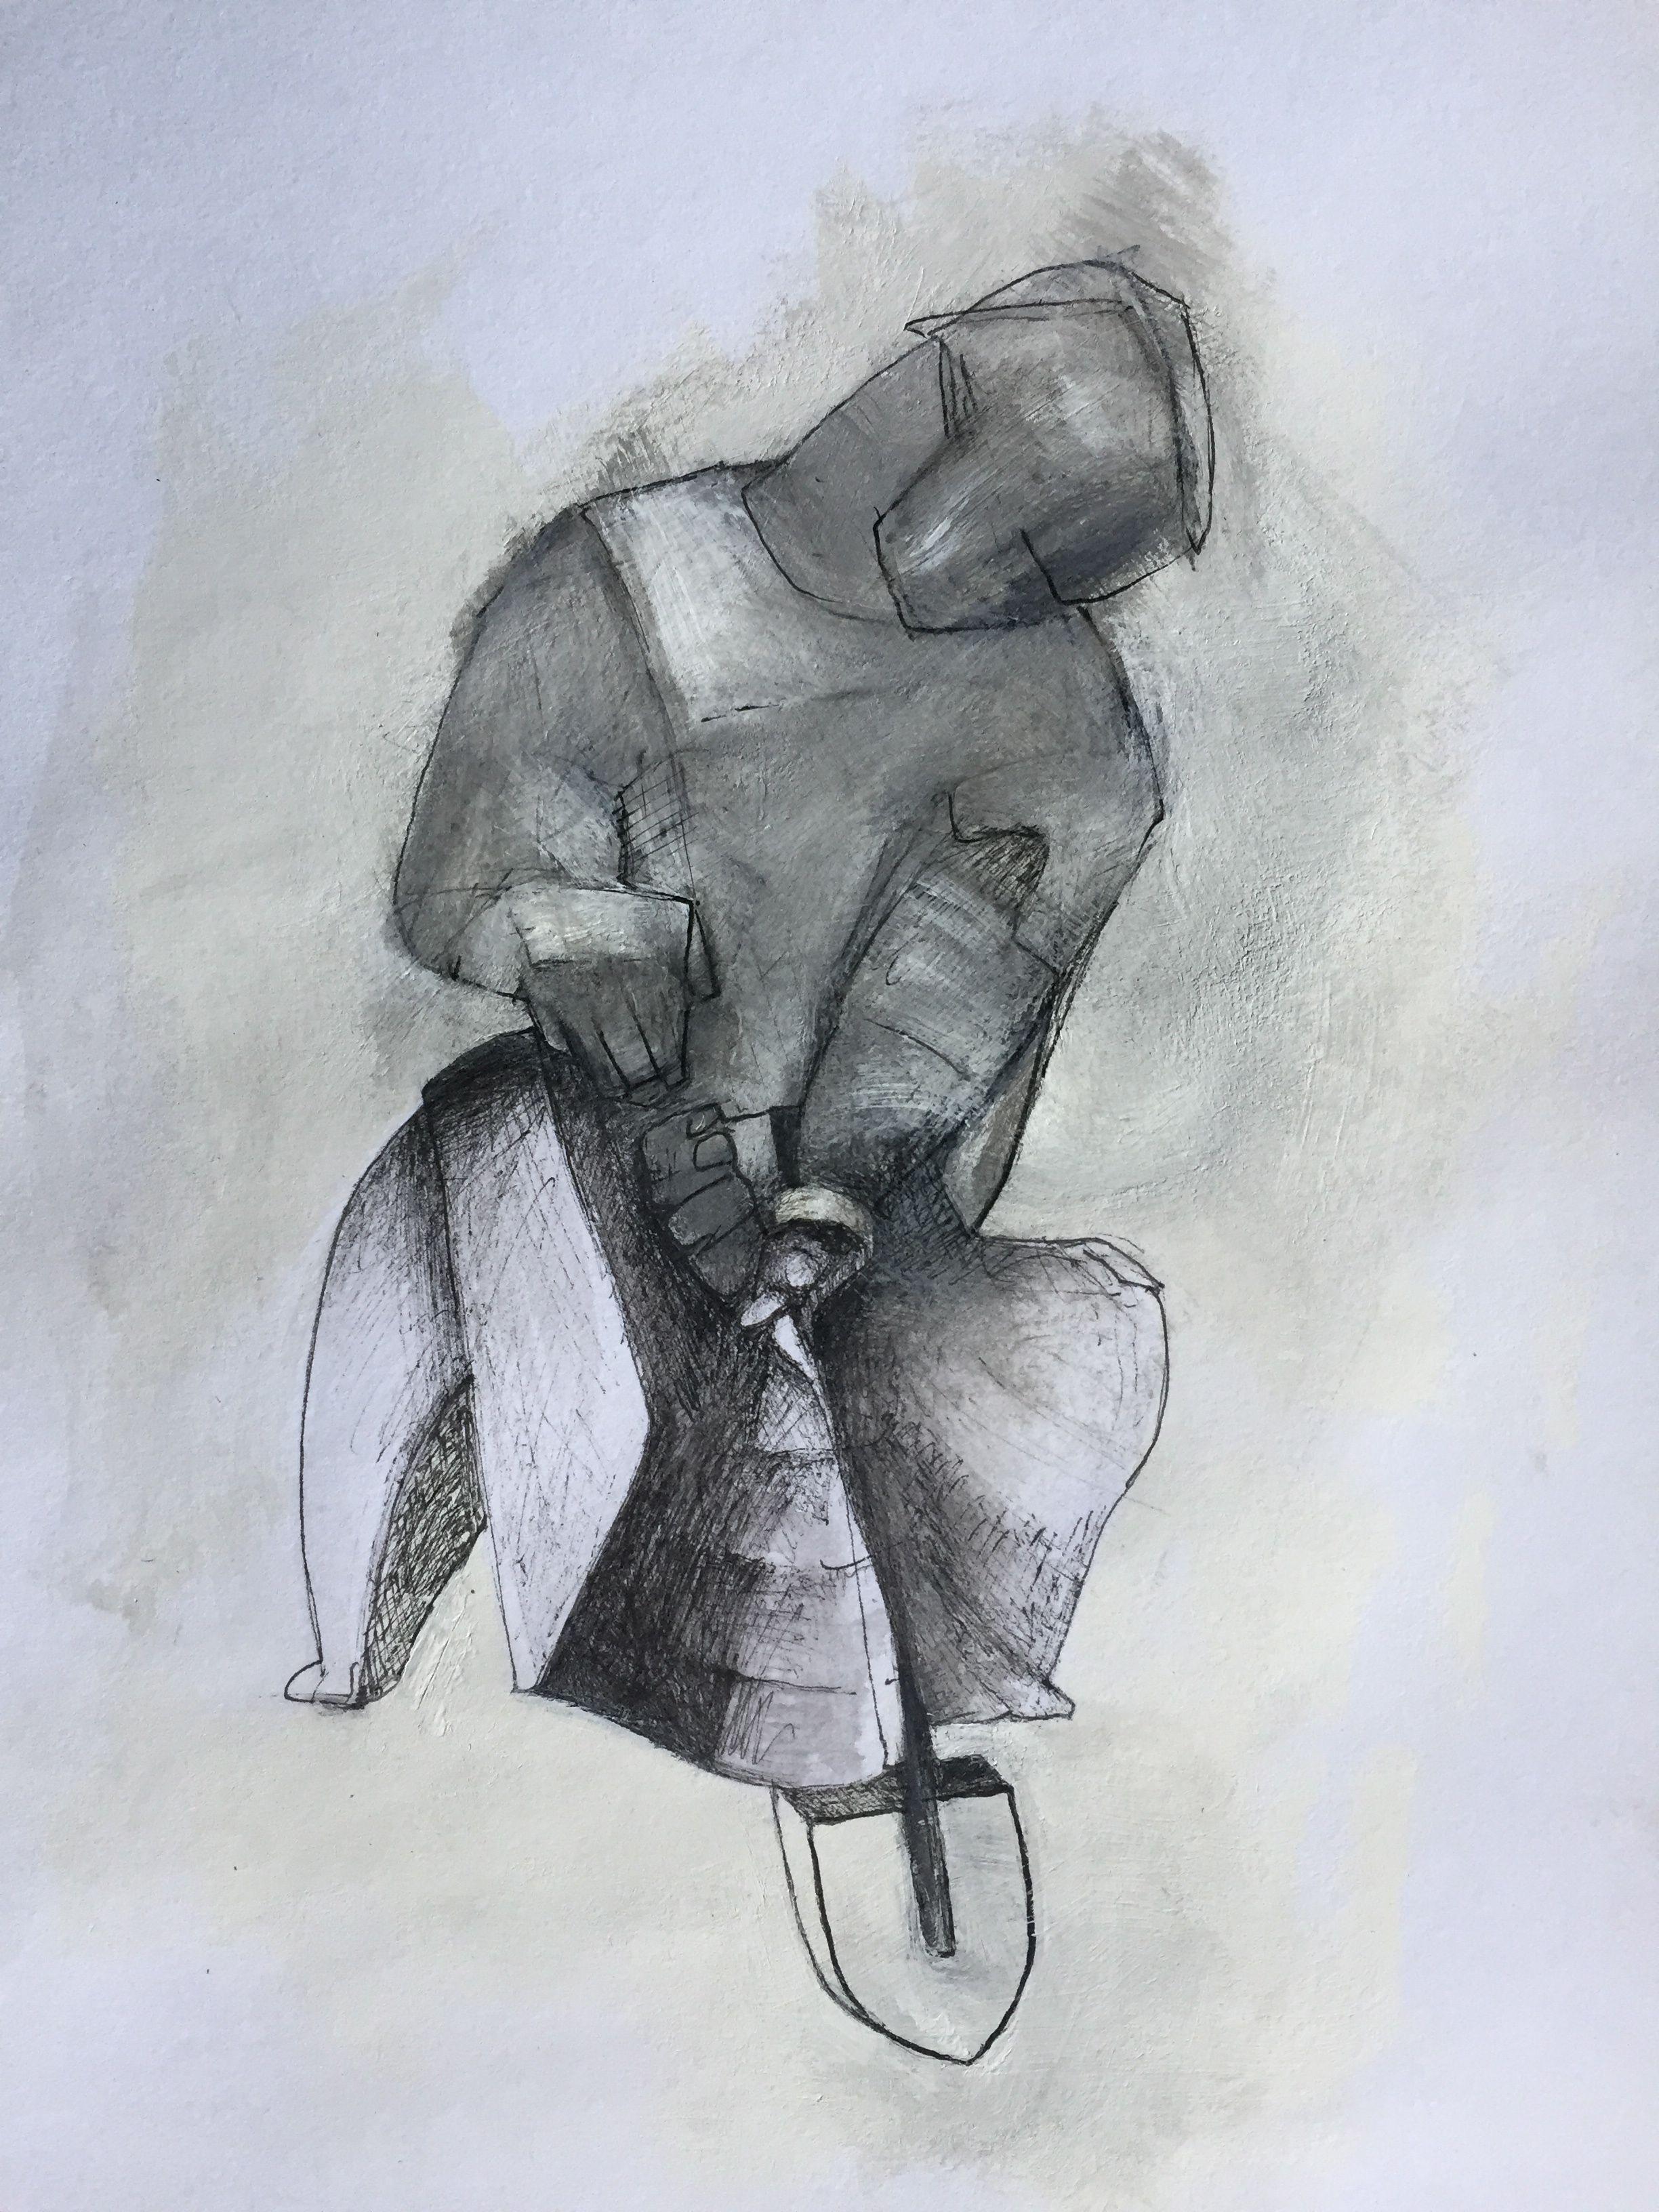 Man with Shovel